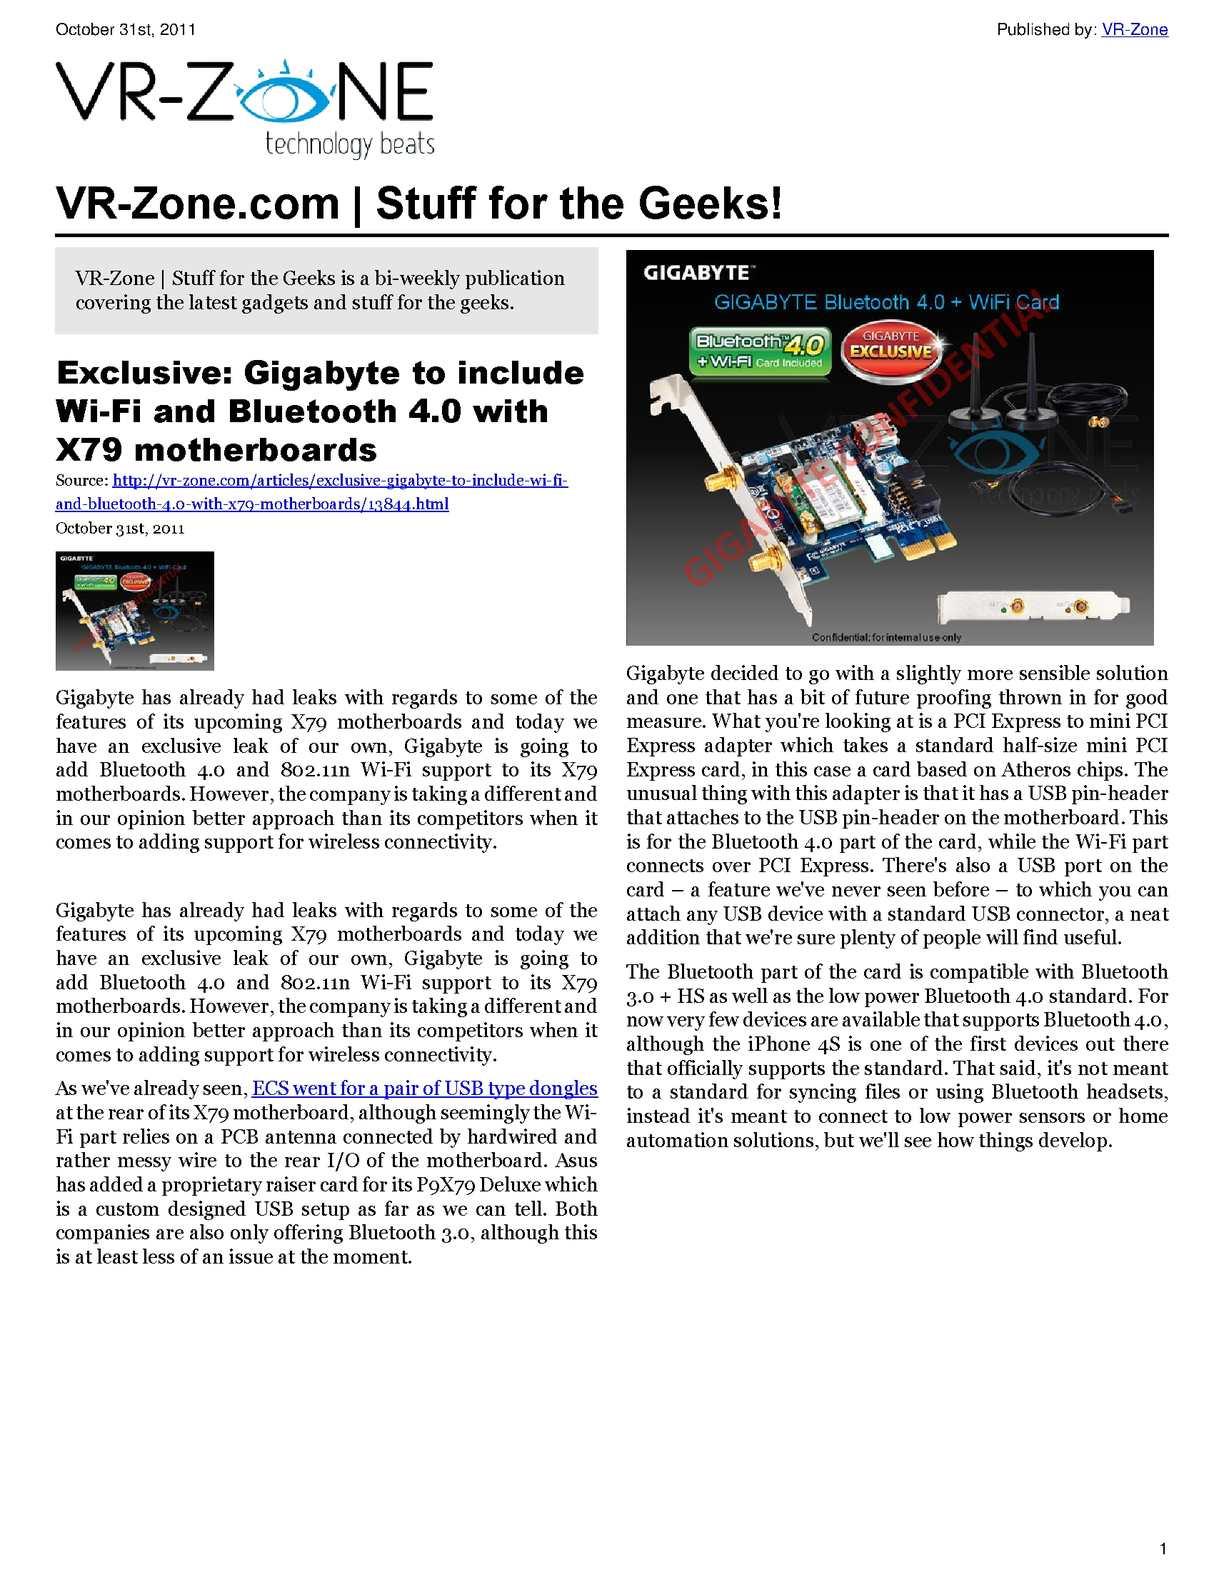 calamo vr zone tech news for the geeks nov 2011 issue